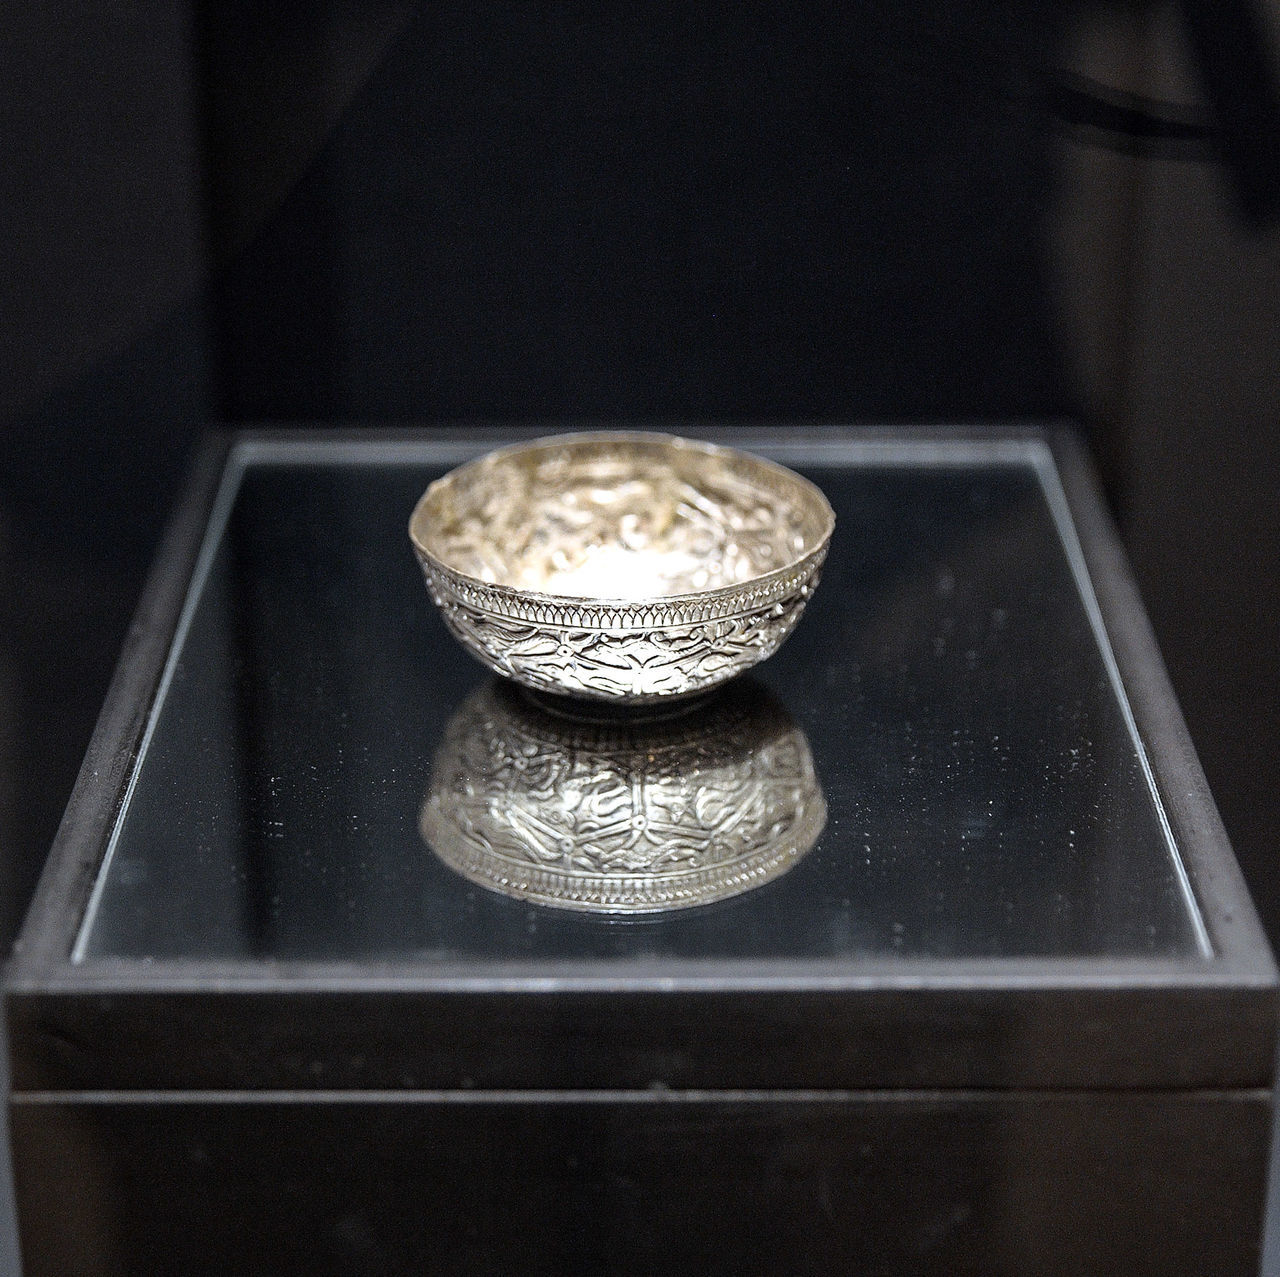 Silver Grass Ancient Civilization National Museum Of Korea National Treasure Seoul Korea Seoul History Museum Art Art And Craft Creativity Getting Inspired Feeling Inspired